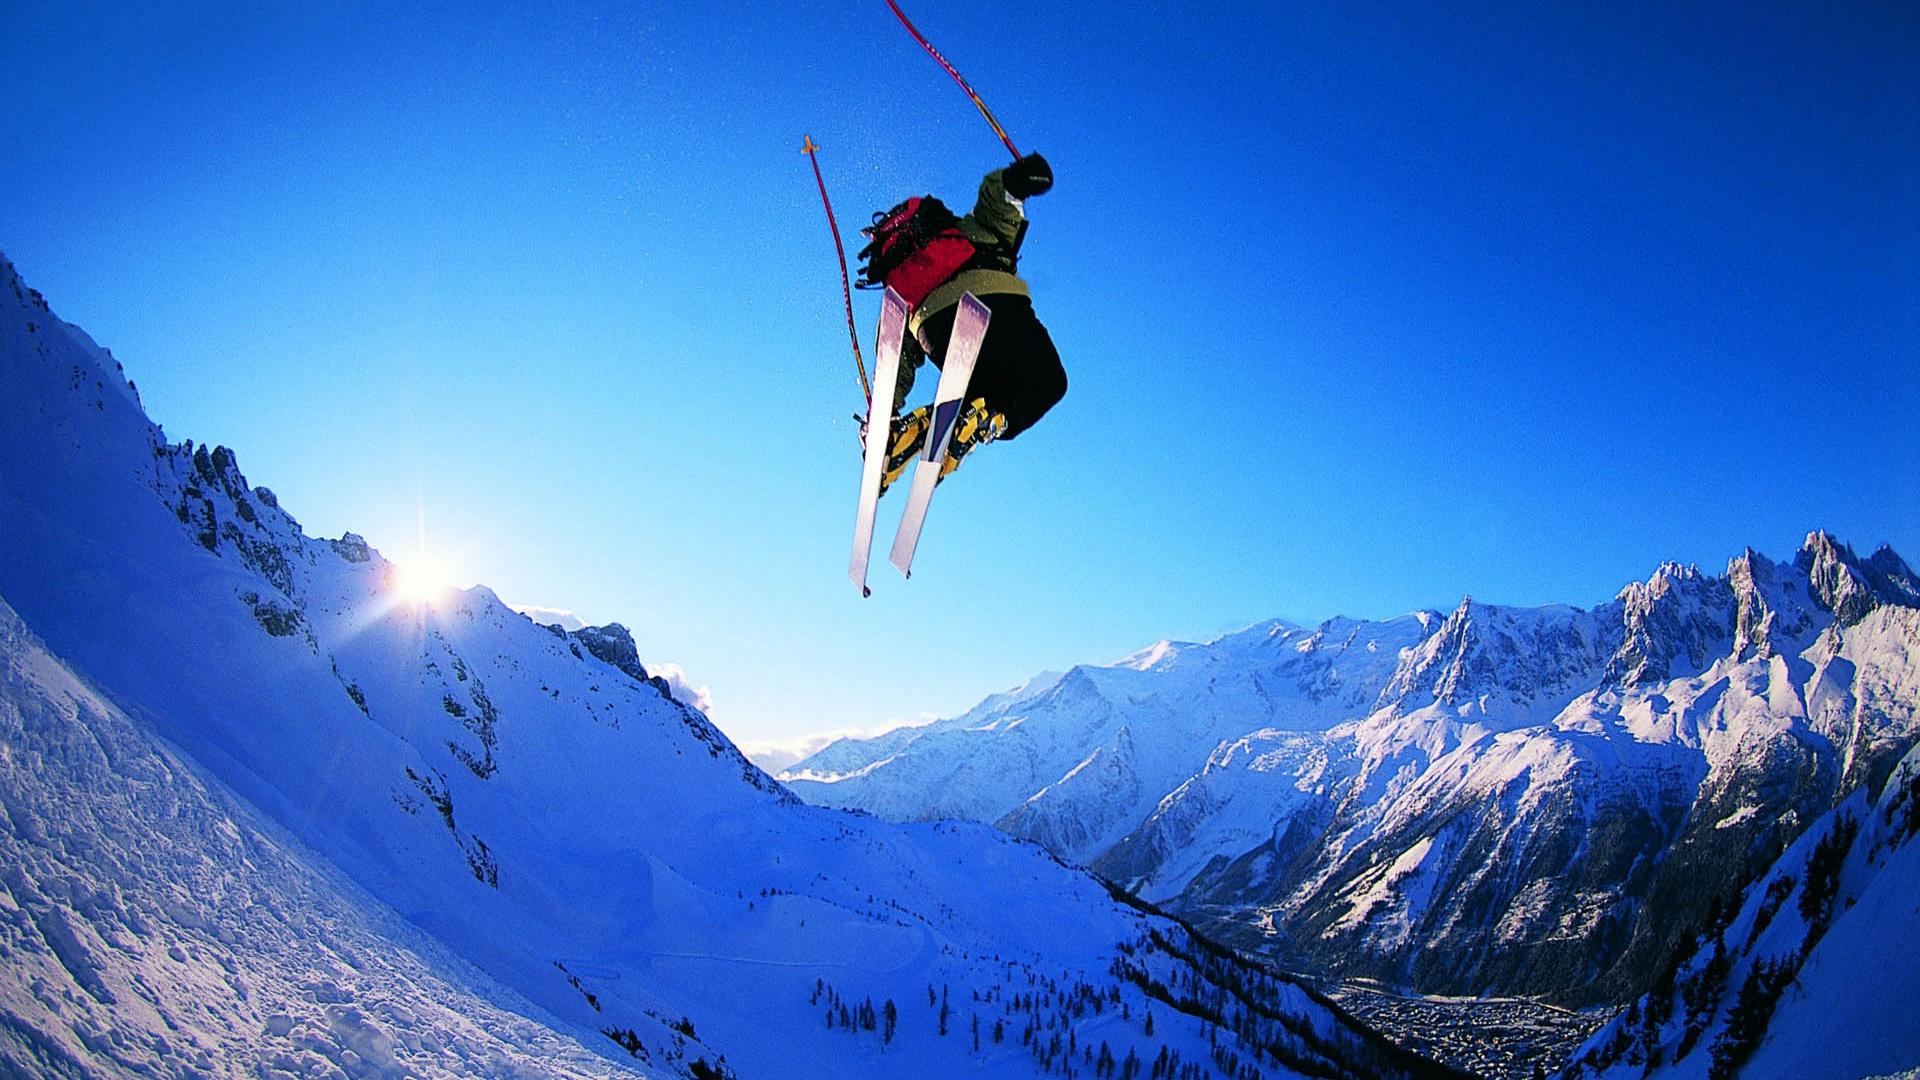 Snowboarding Wallpapers For Desktop